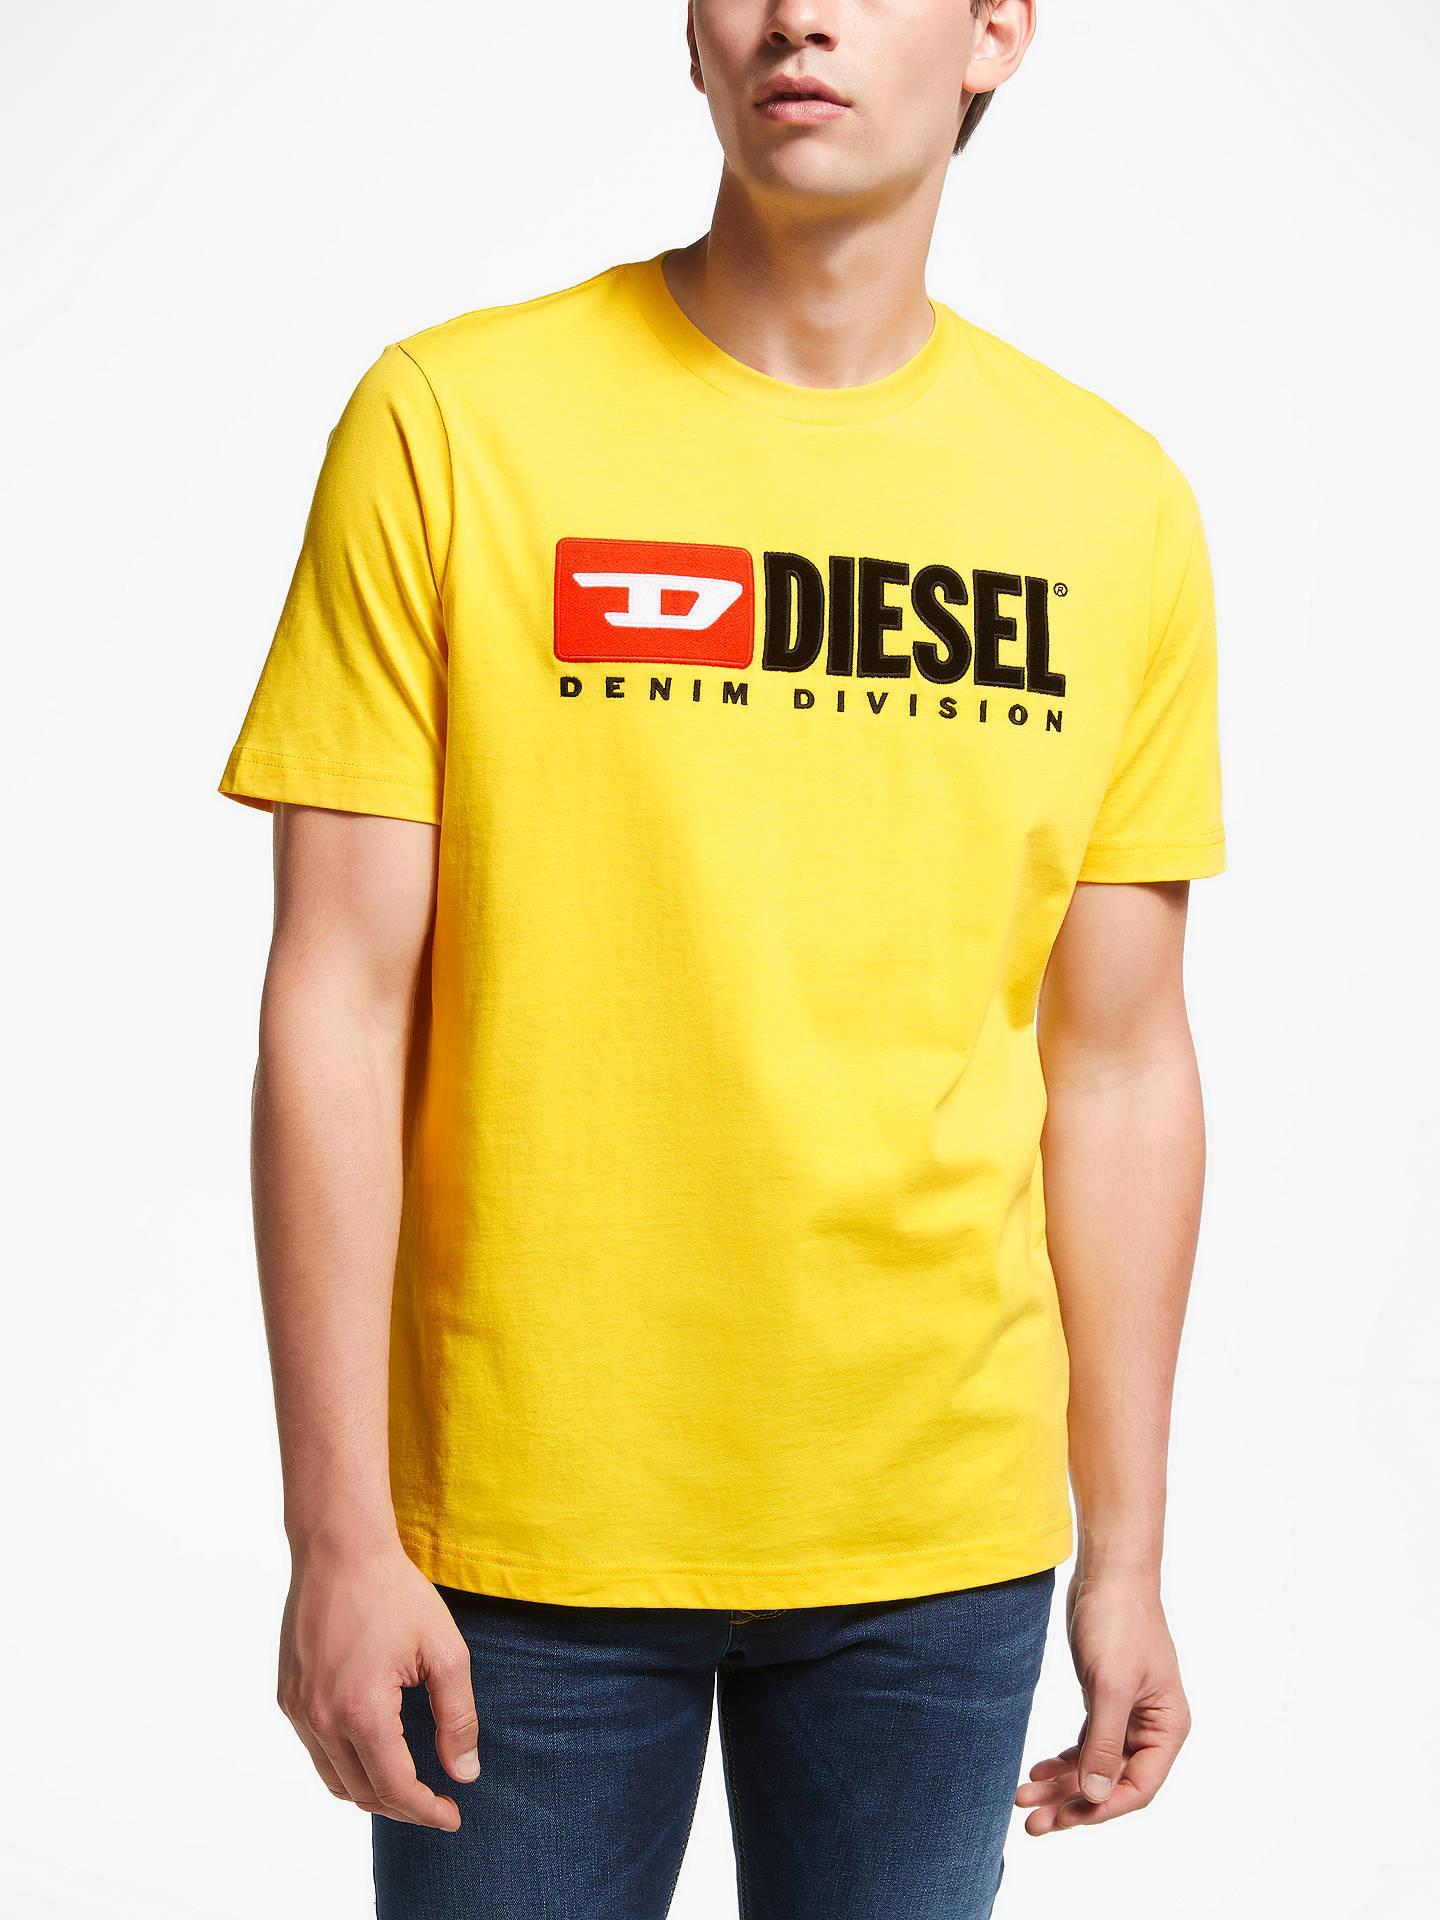 2df44e0b616c61 Diesel T-Just Division Short Sleeve Logo T-Shirt, Yellow at John ...